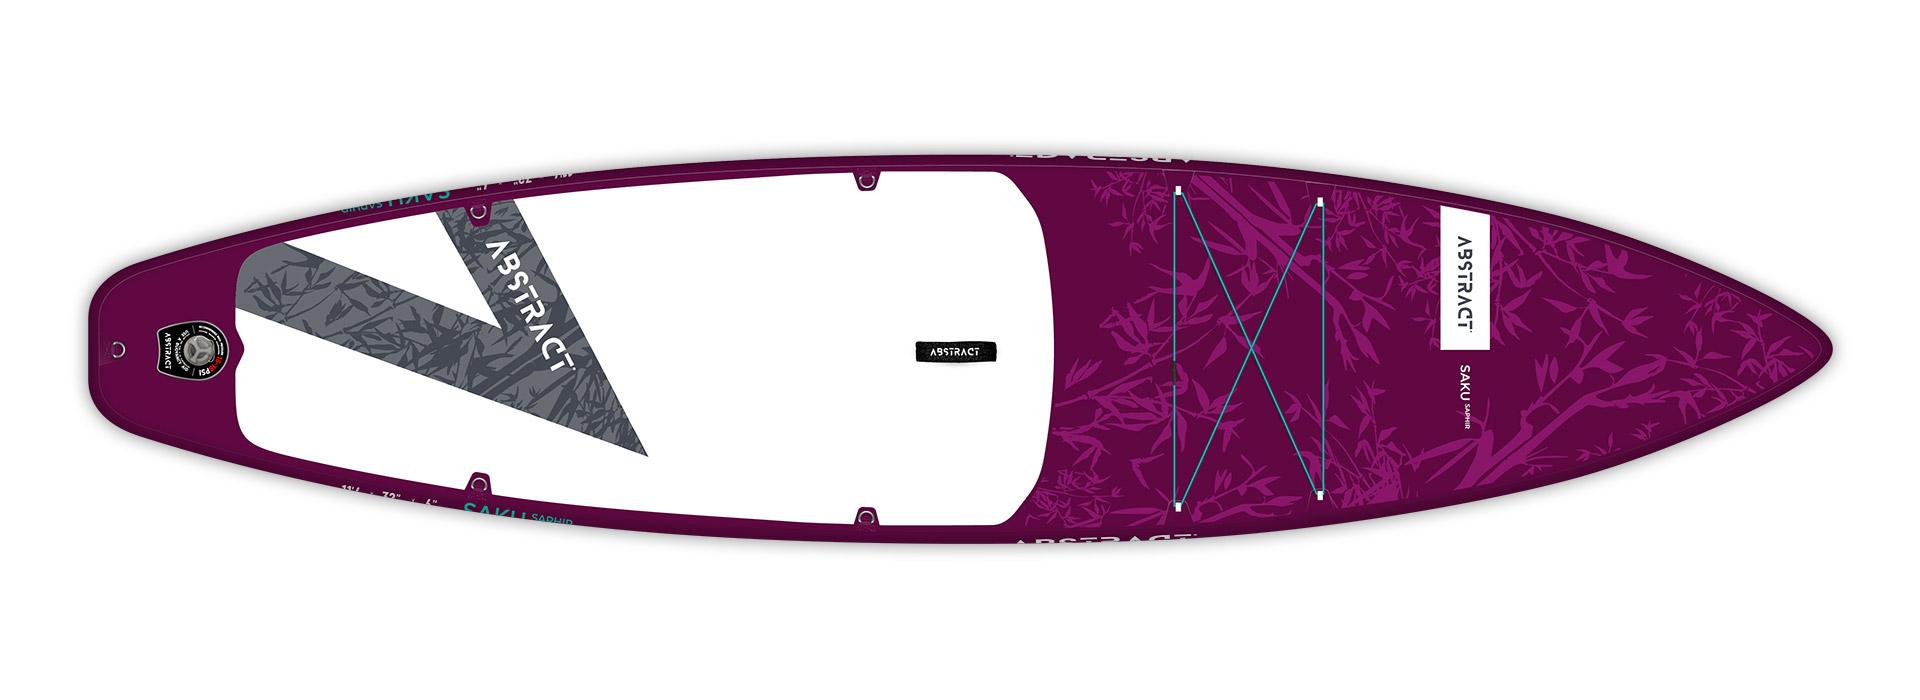 Planche de paddle Board gonflable Saku Saphir (violet) Abstract 2021